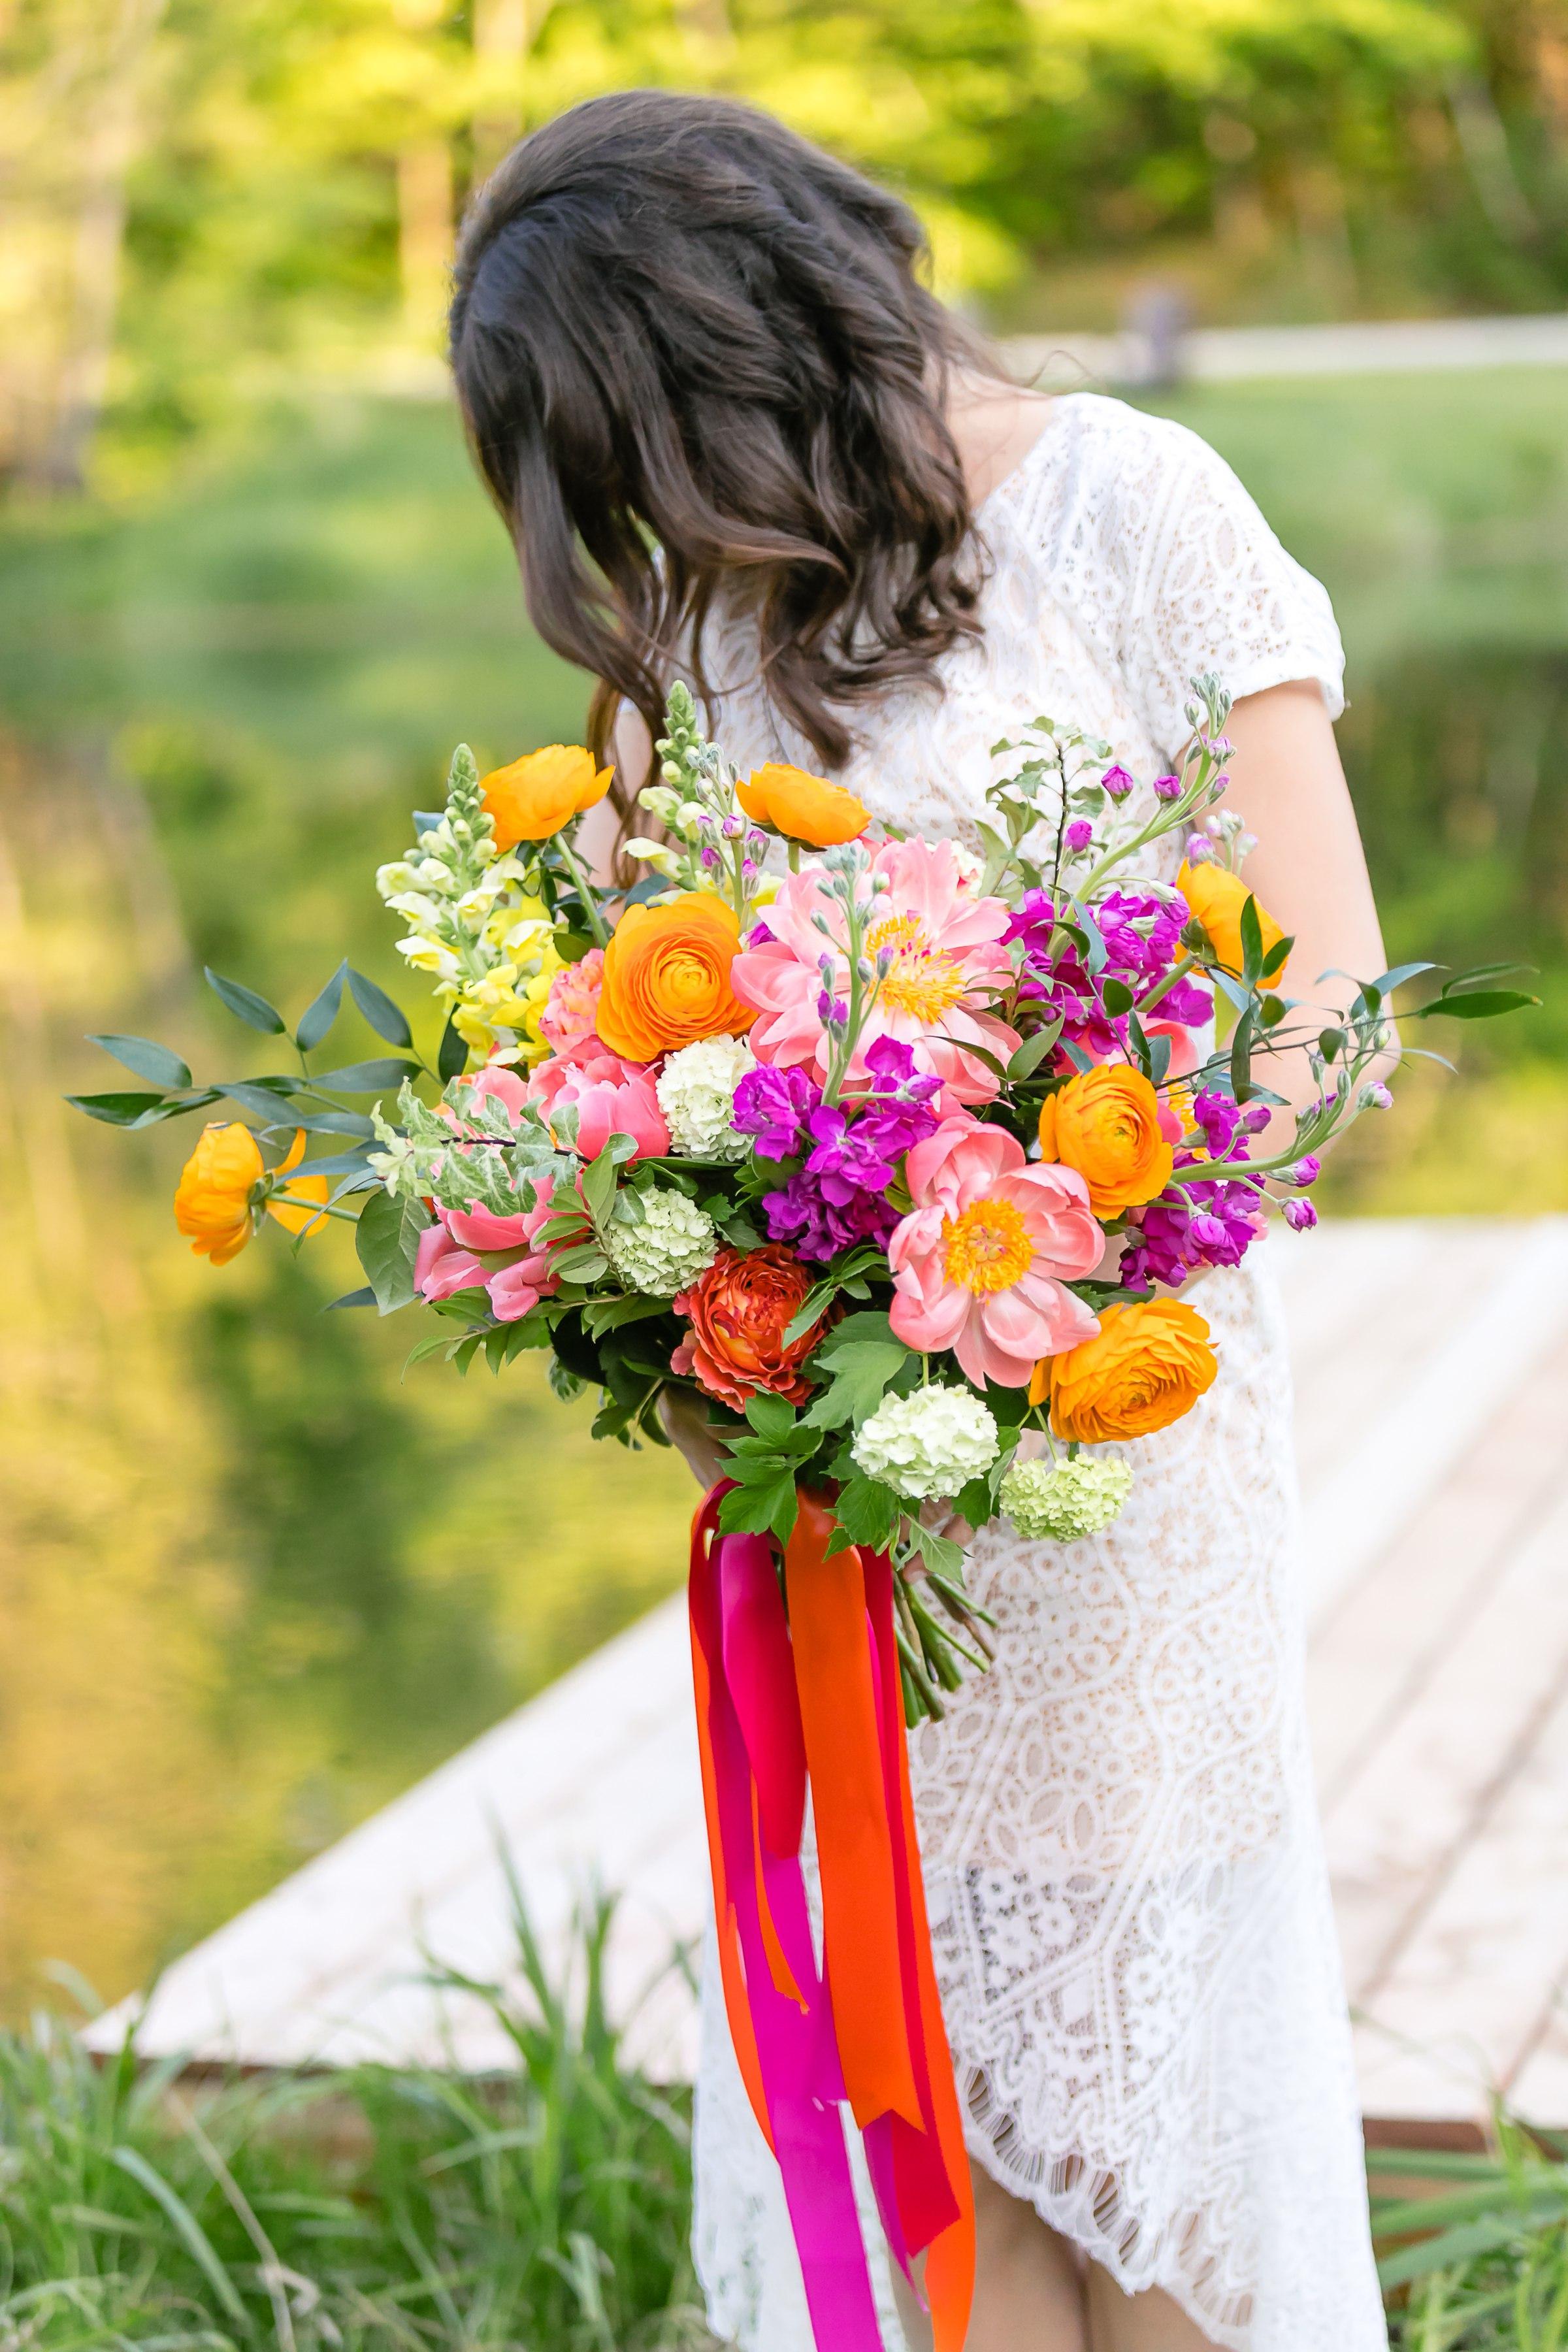 jals-whispering-springs-styled-elopement_0053.jpg